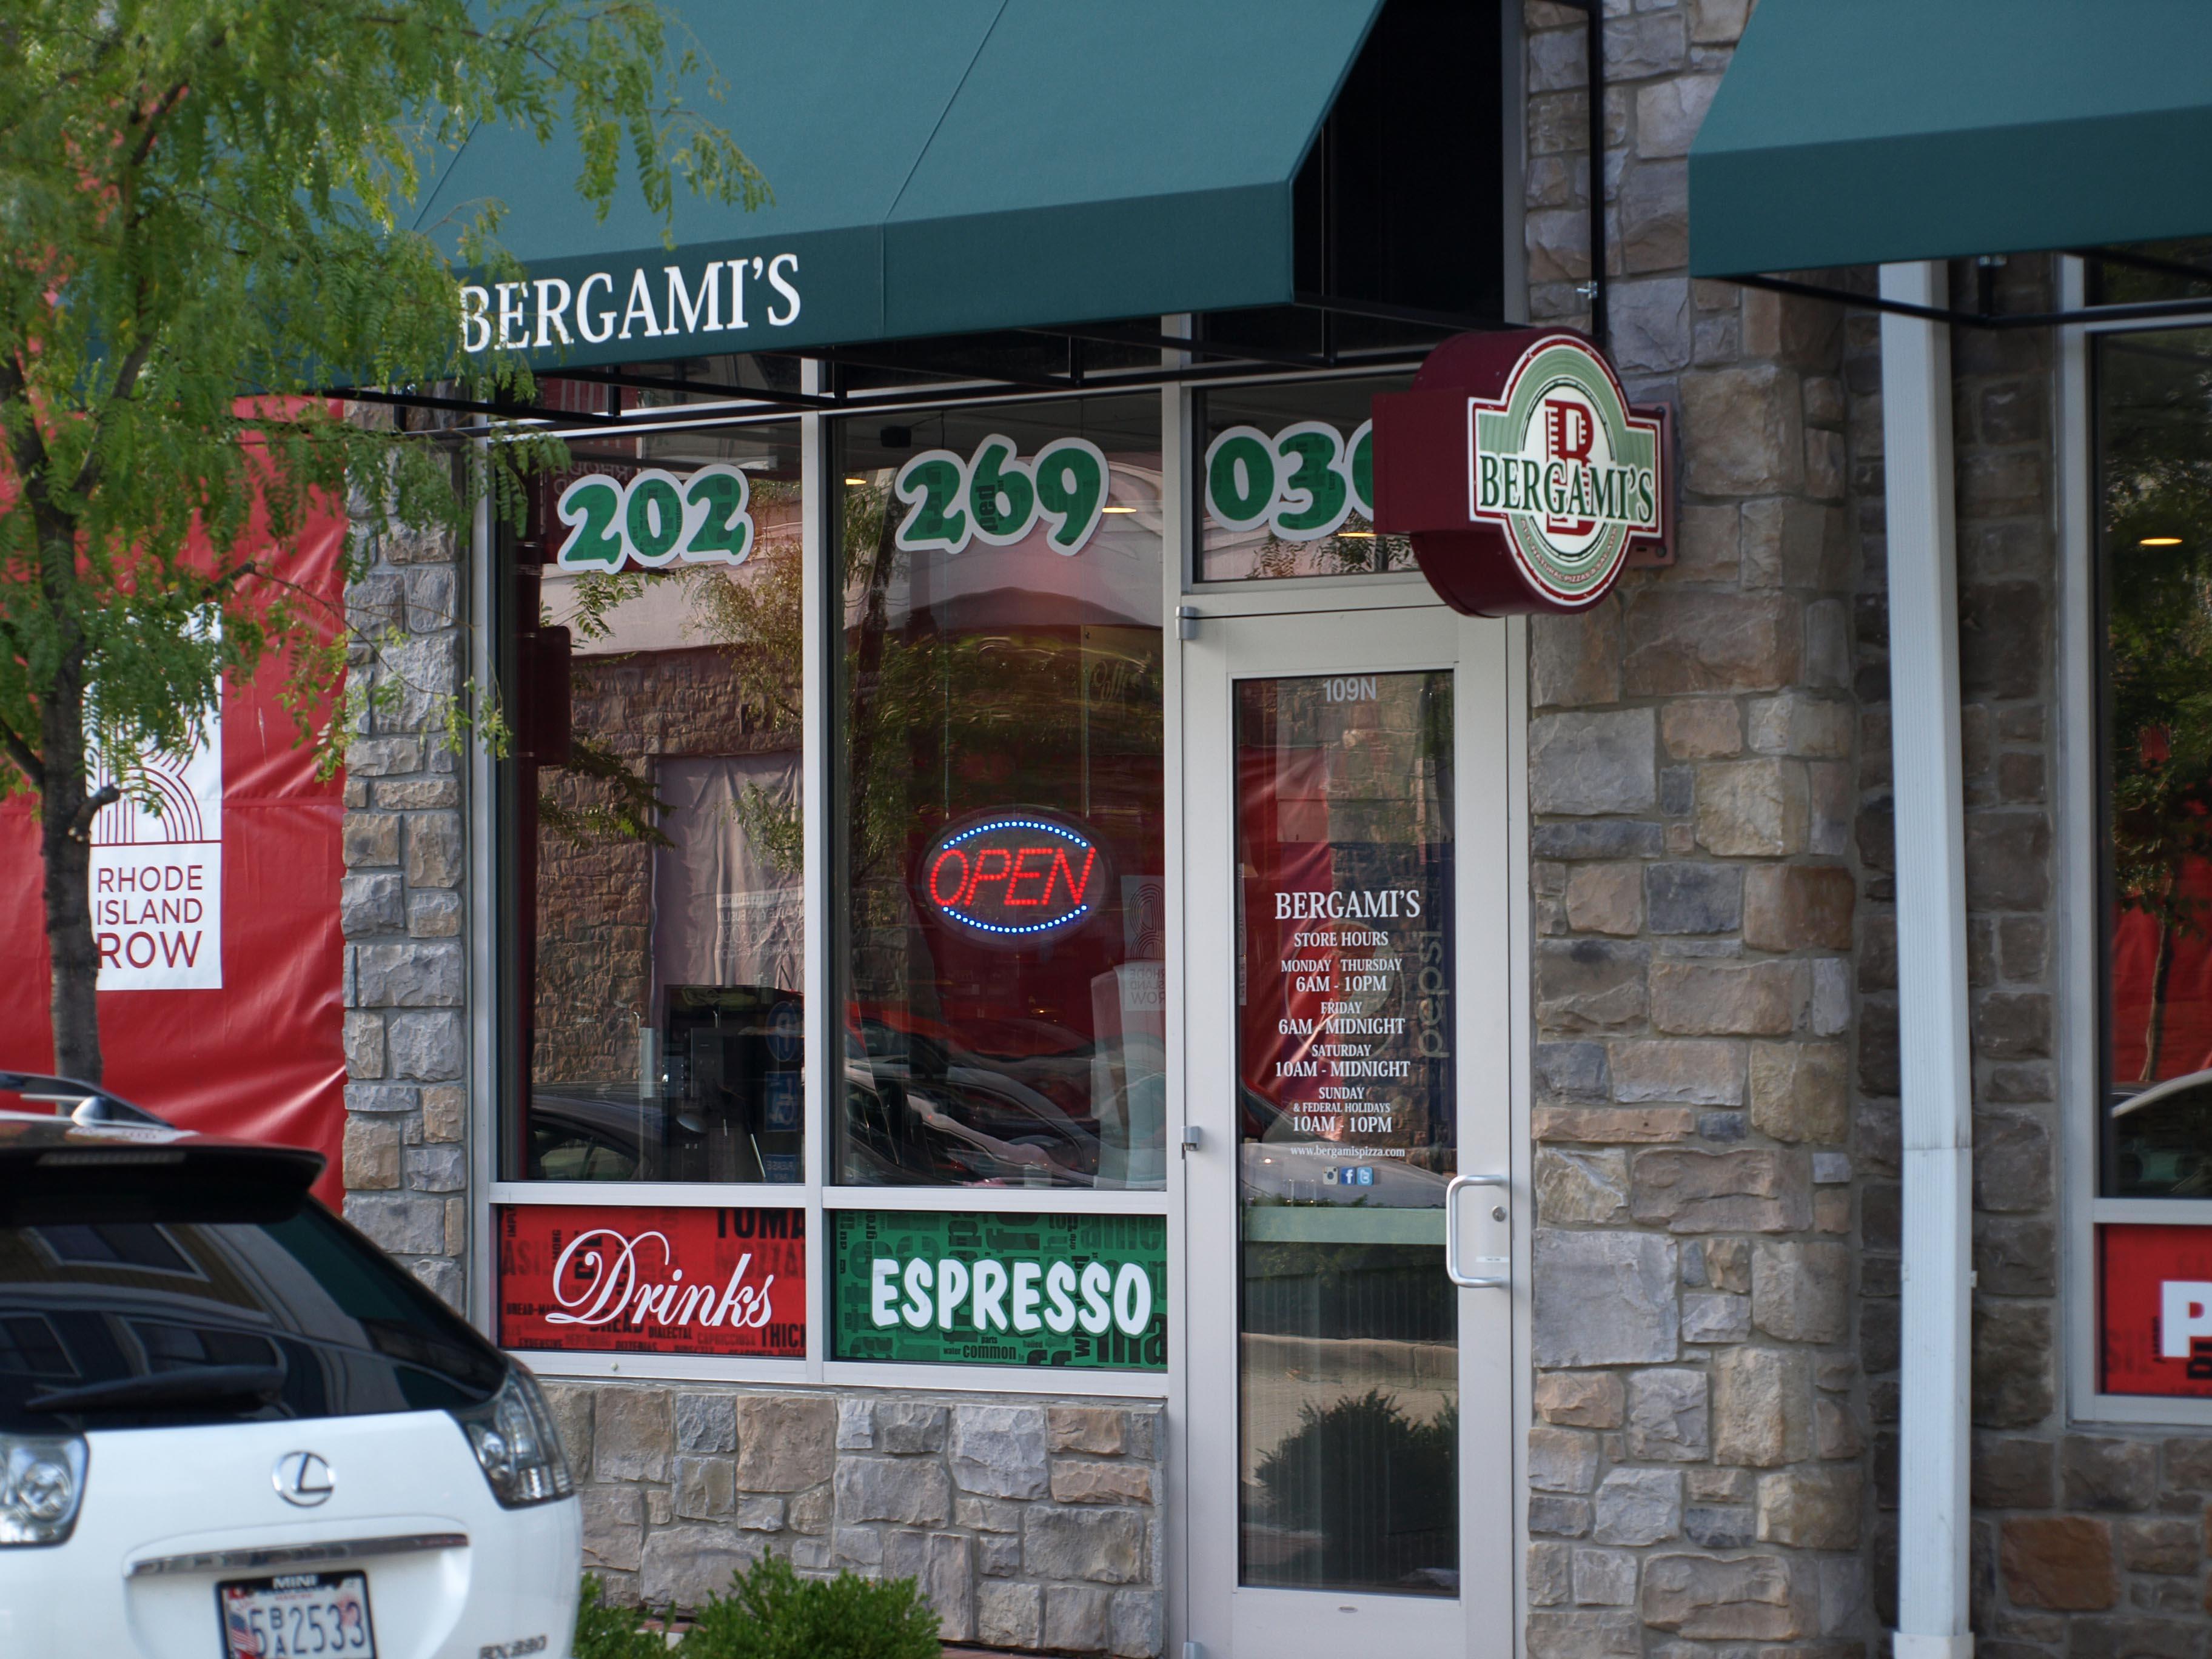 Bergami's